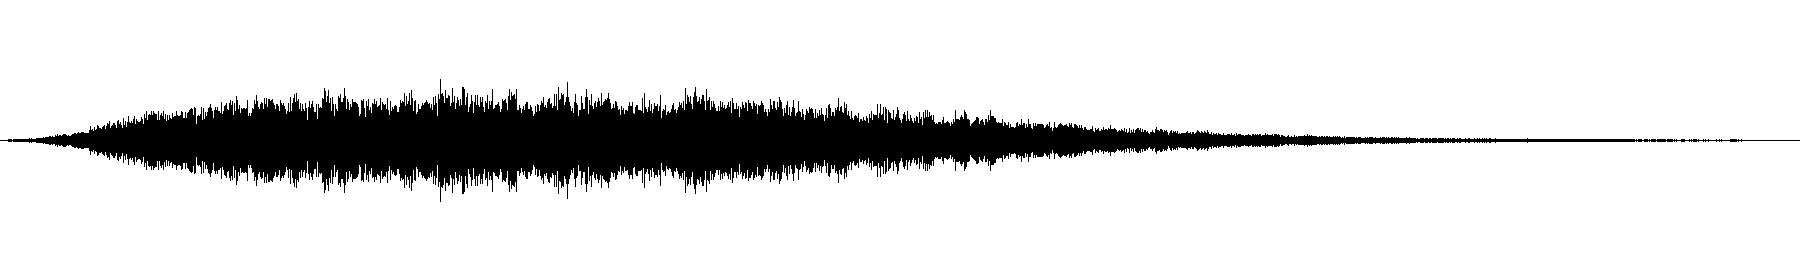 synth choir caug5